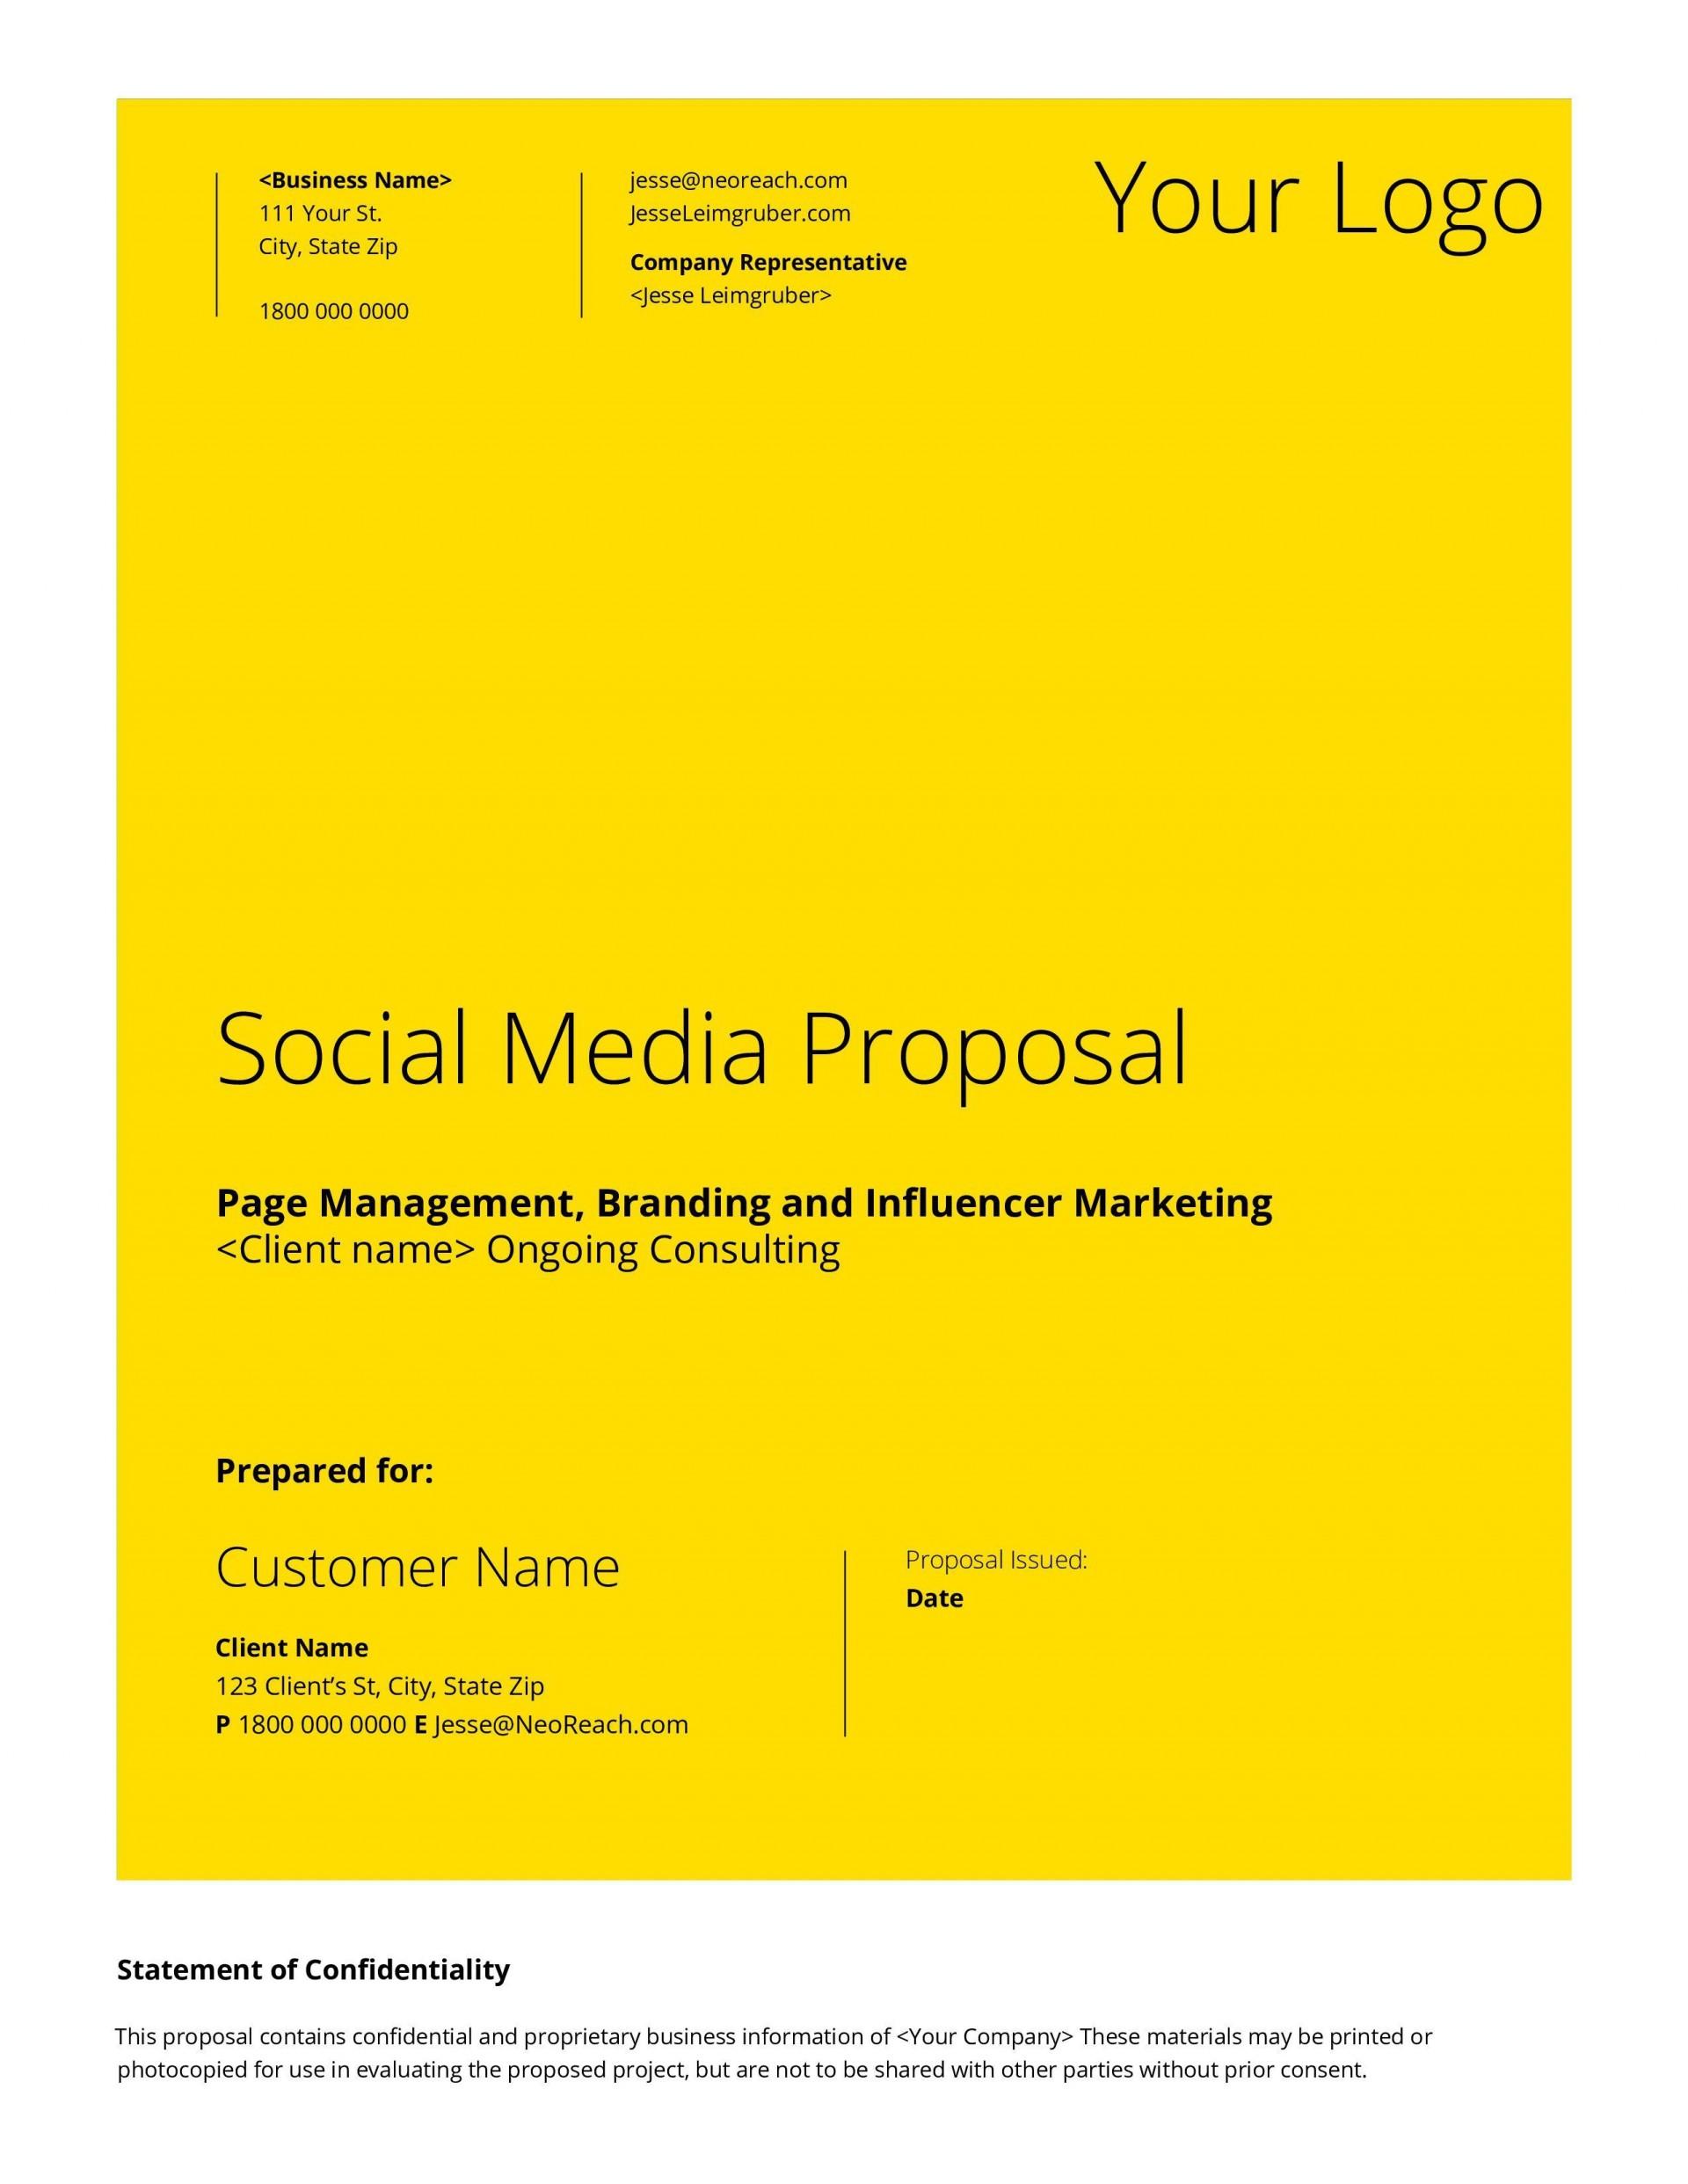 008 Frightening Social Media Proposal Template 2019 Inspiration 1920